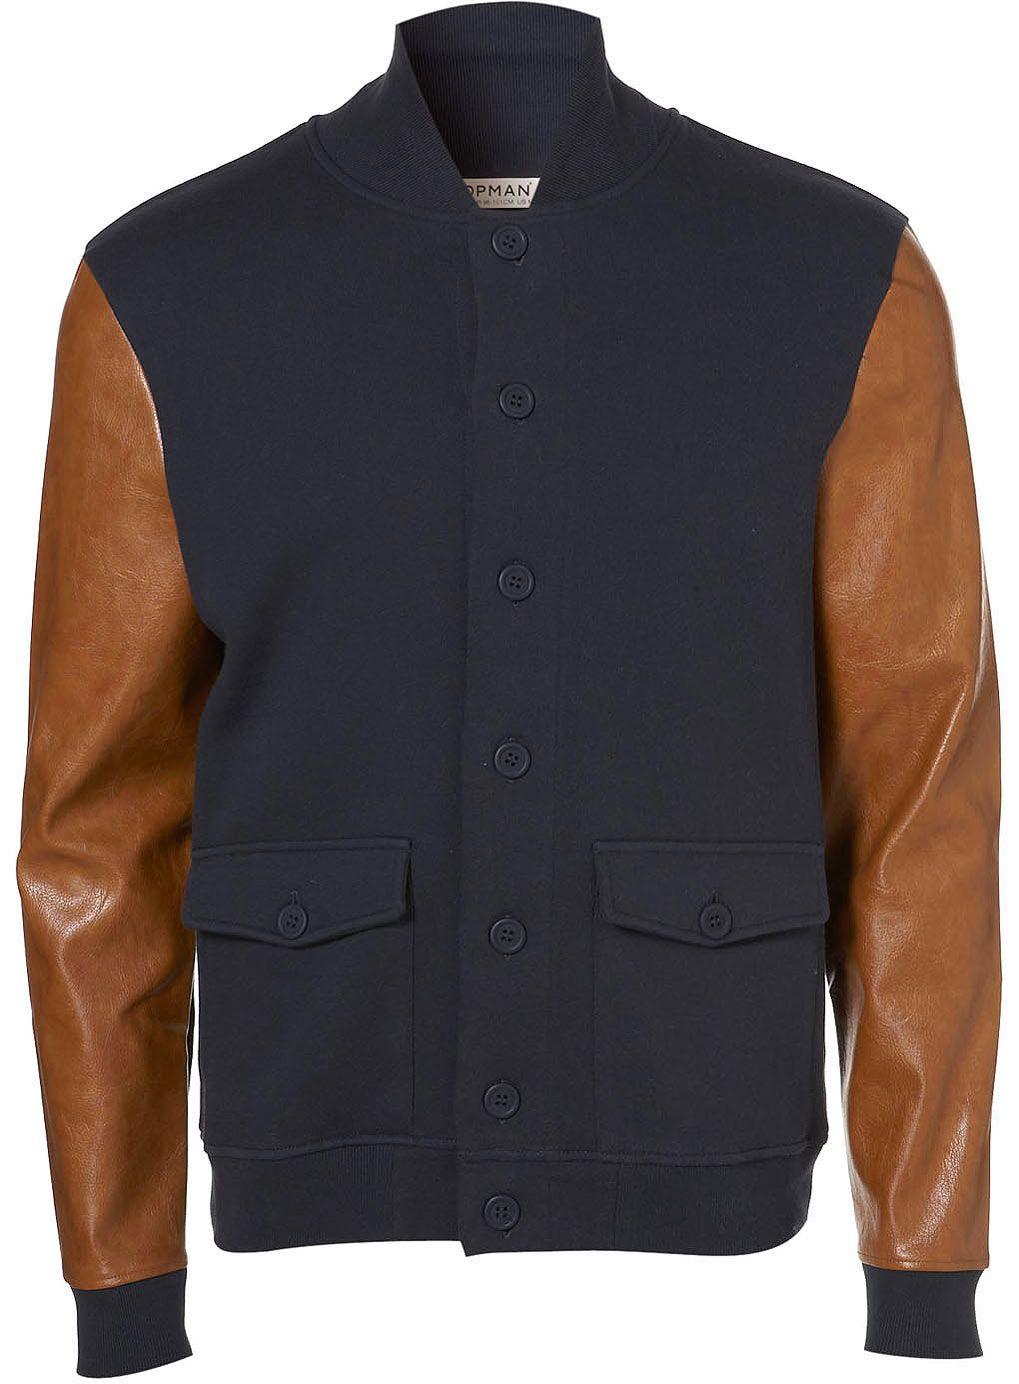 Topman - Navy Jersey Baseball Jacket | Mens Clothing | Pinterest